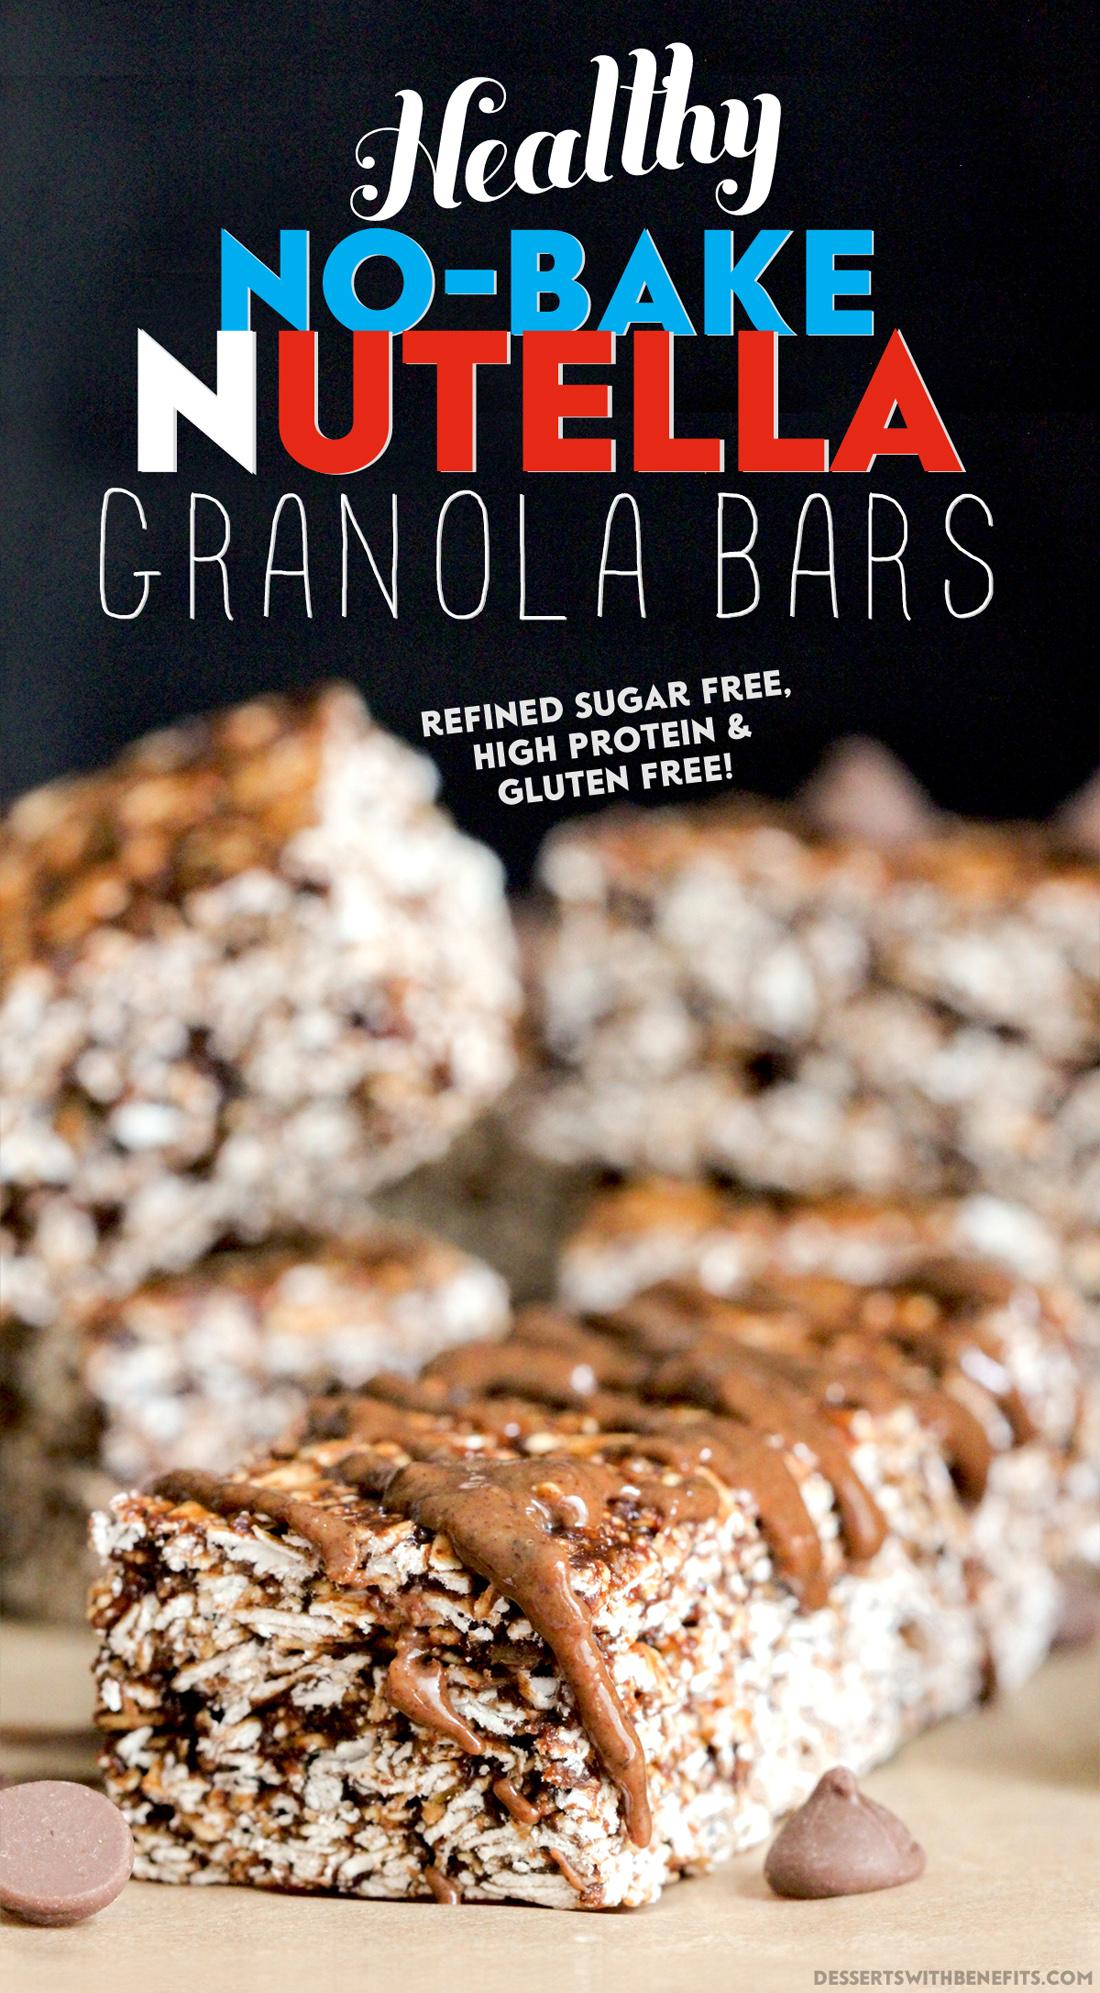 Healthy No-Bake Nutella Granola Bars (refined sugar free, high protein, high fiber, gluten free) - Healthy Dessert Recipes at Desserts with Benefits